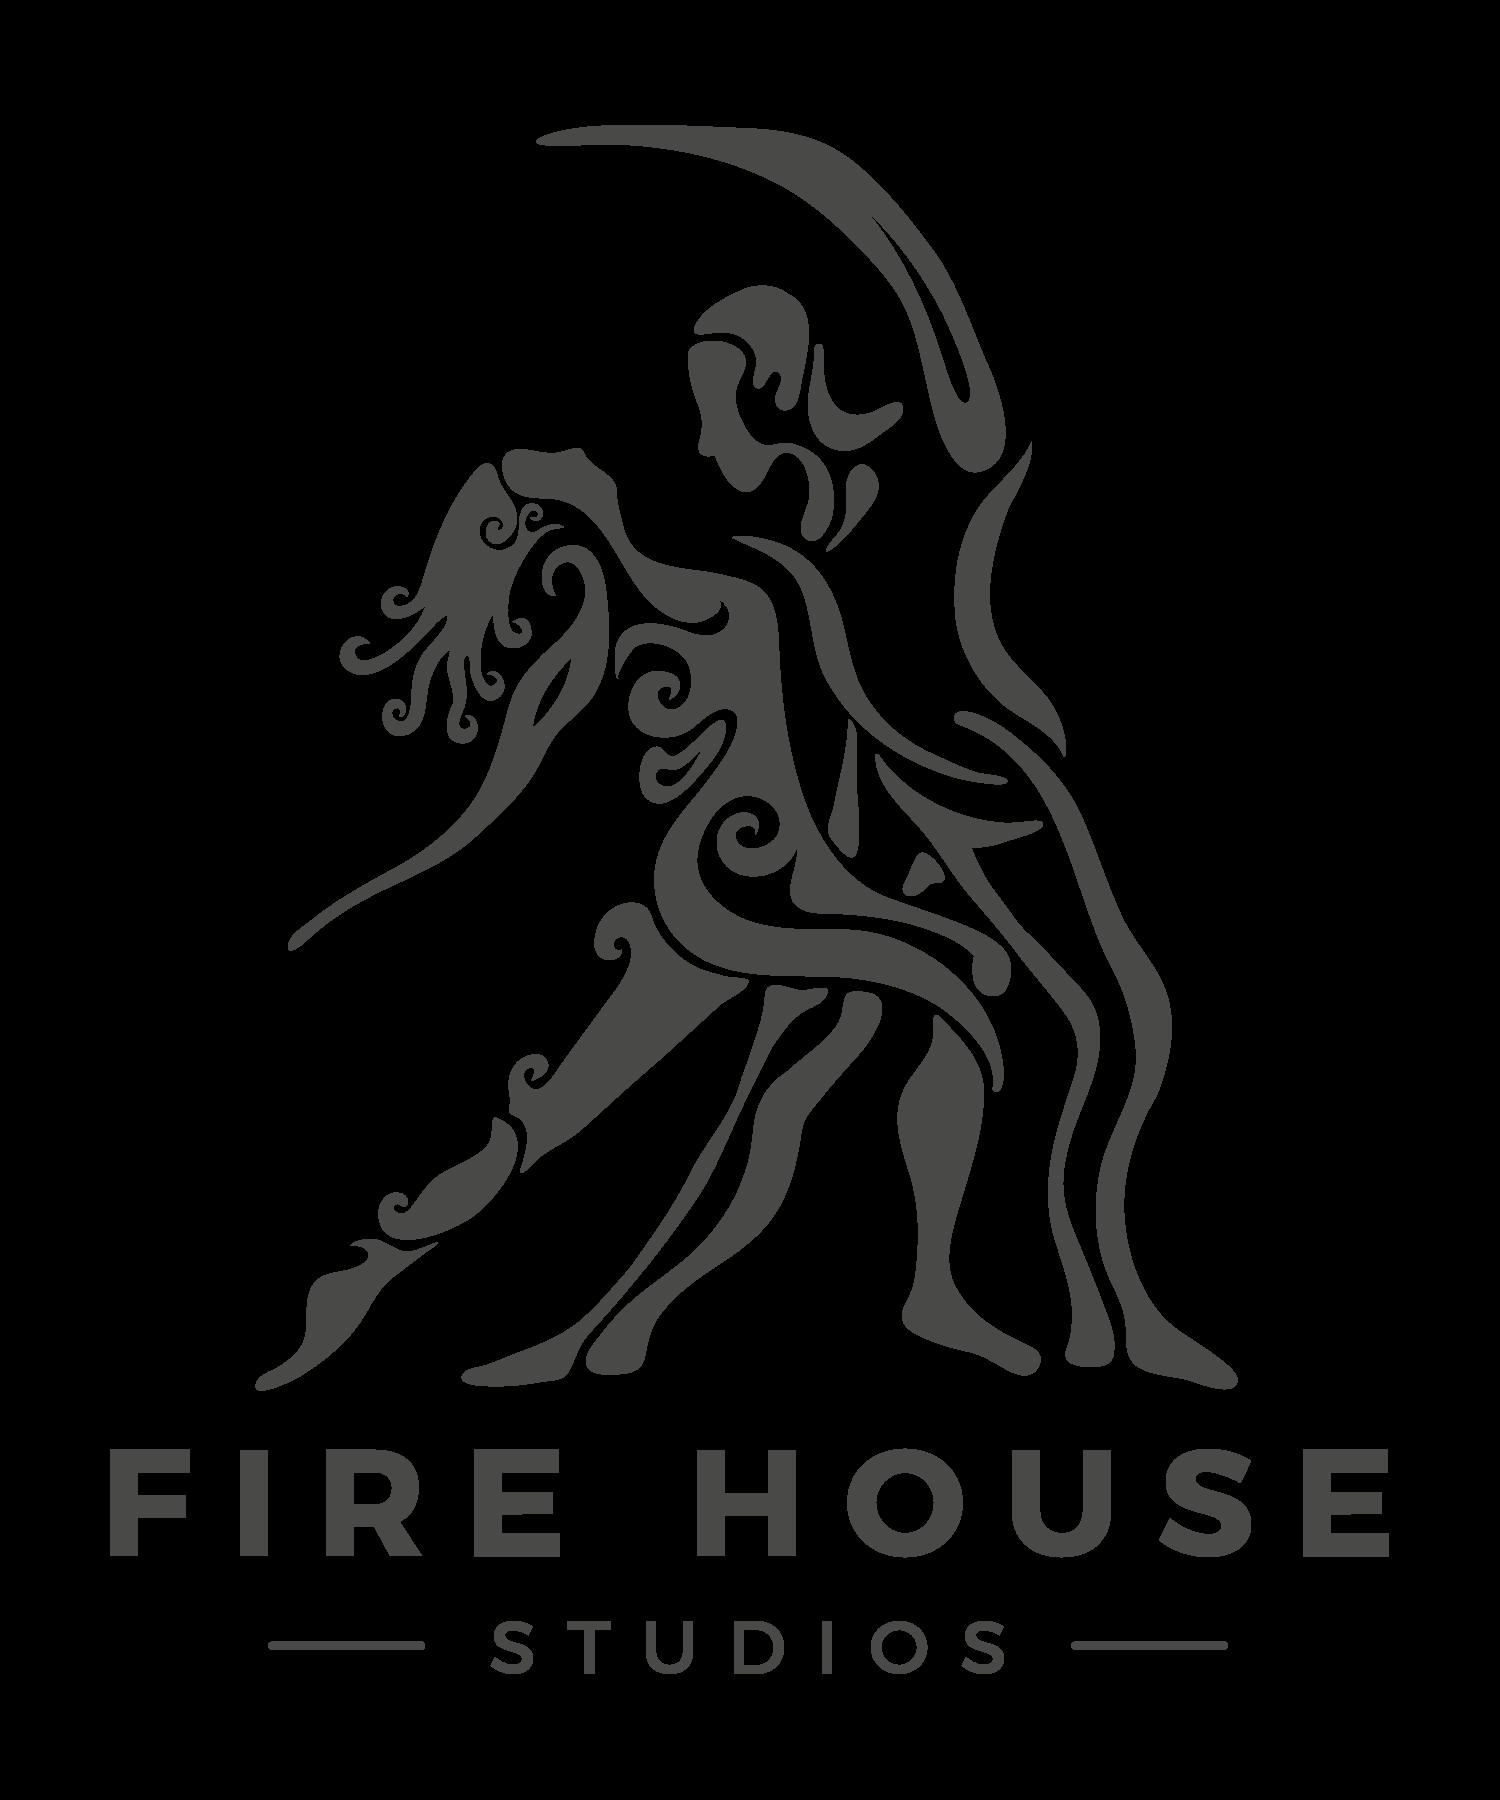 Fire House Studios Skipton